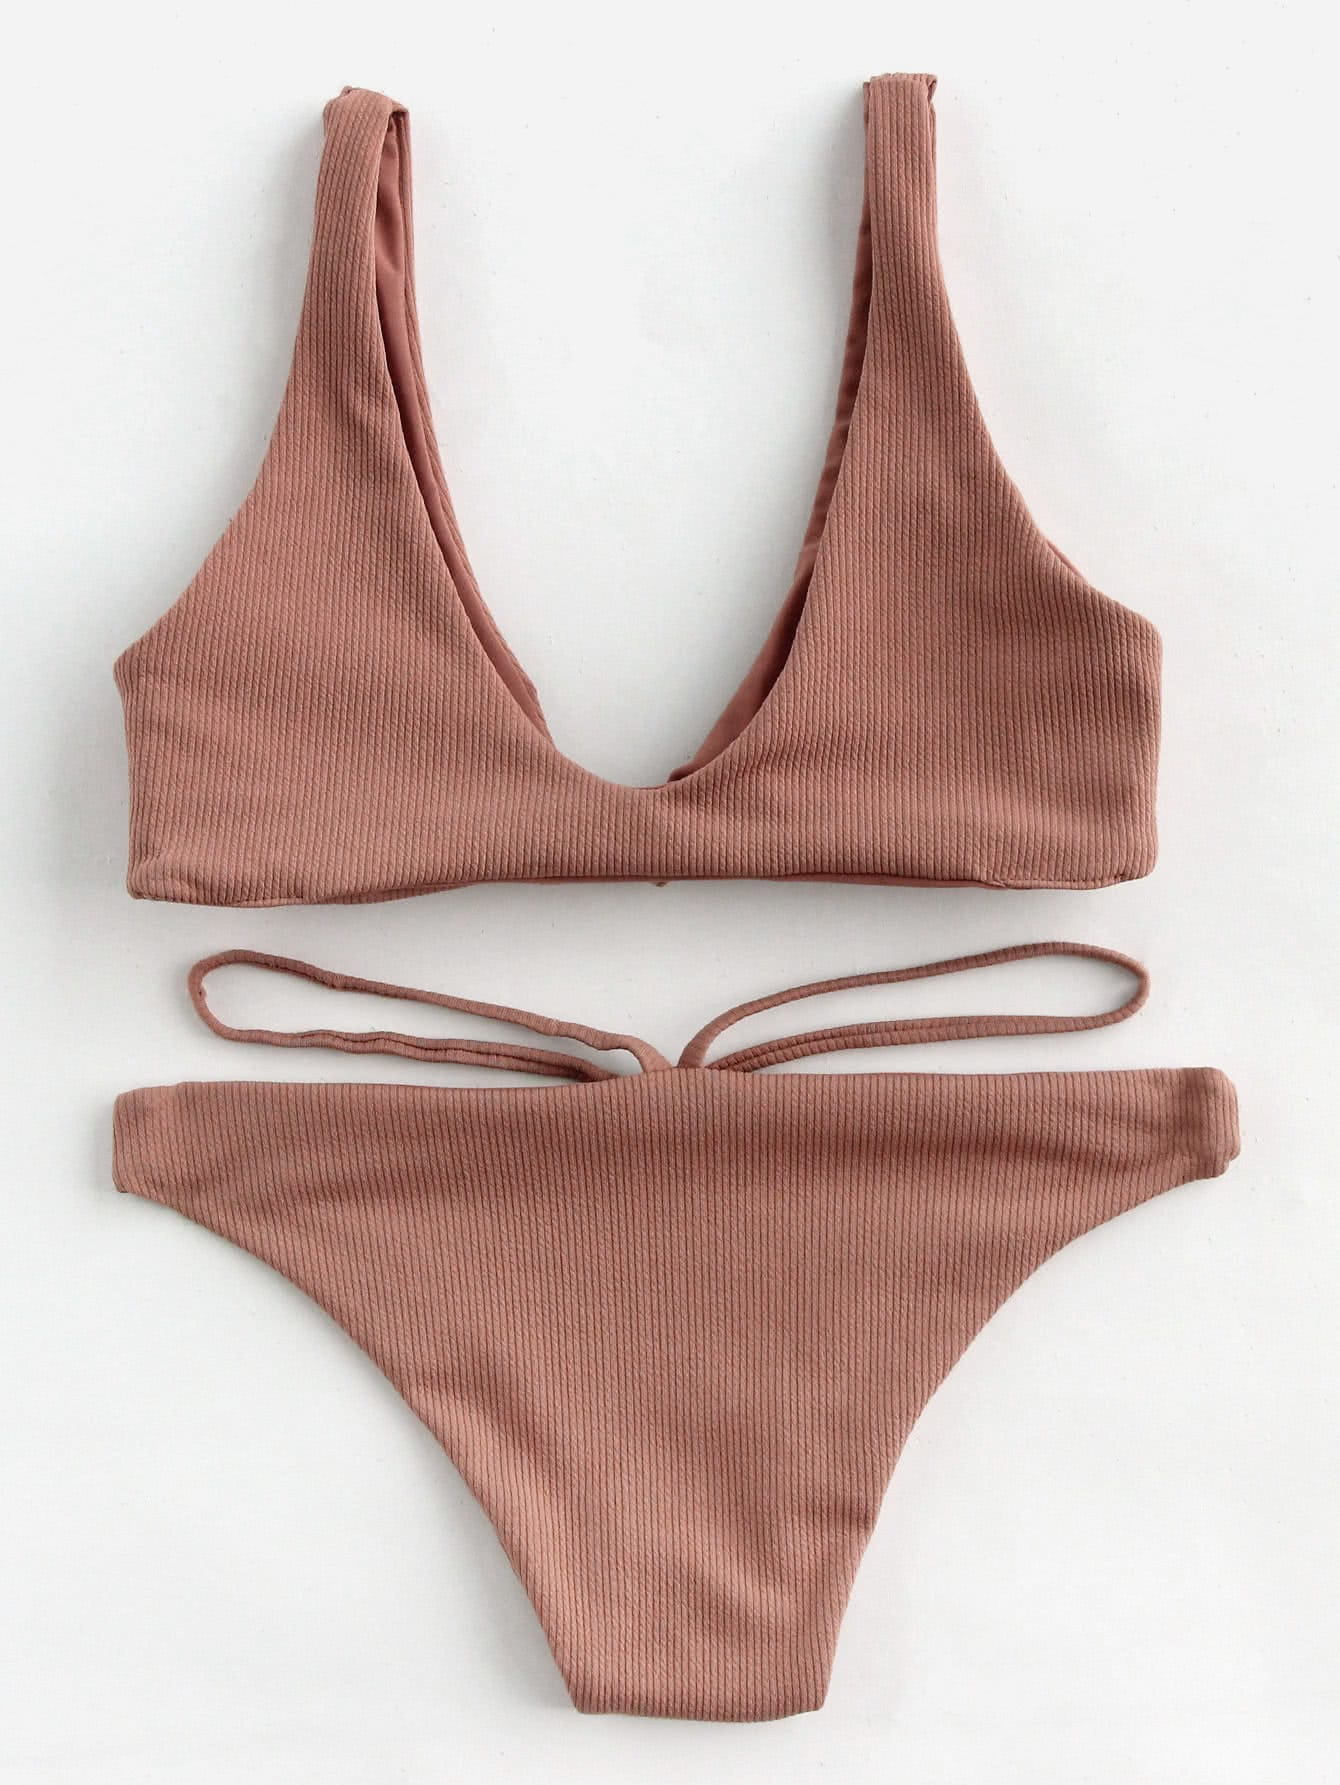 9e285b27554a3 Knot Ribbed Top With Strap Panty Bikini Set EmmaCloth-Women Fast ...